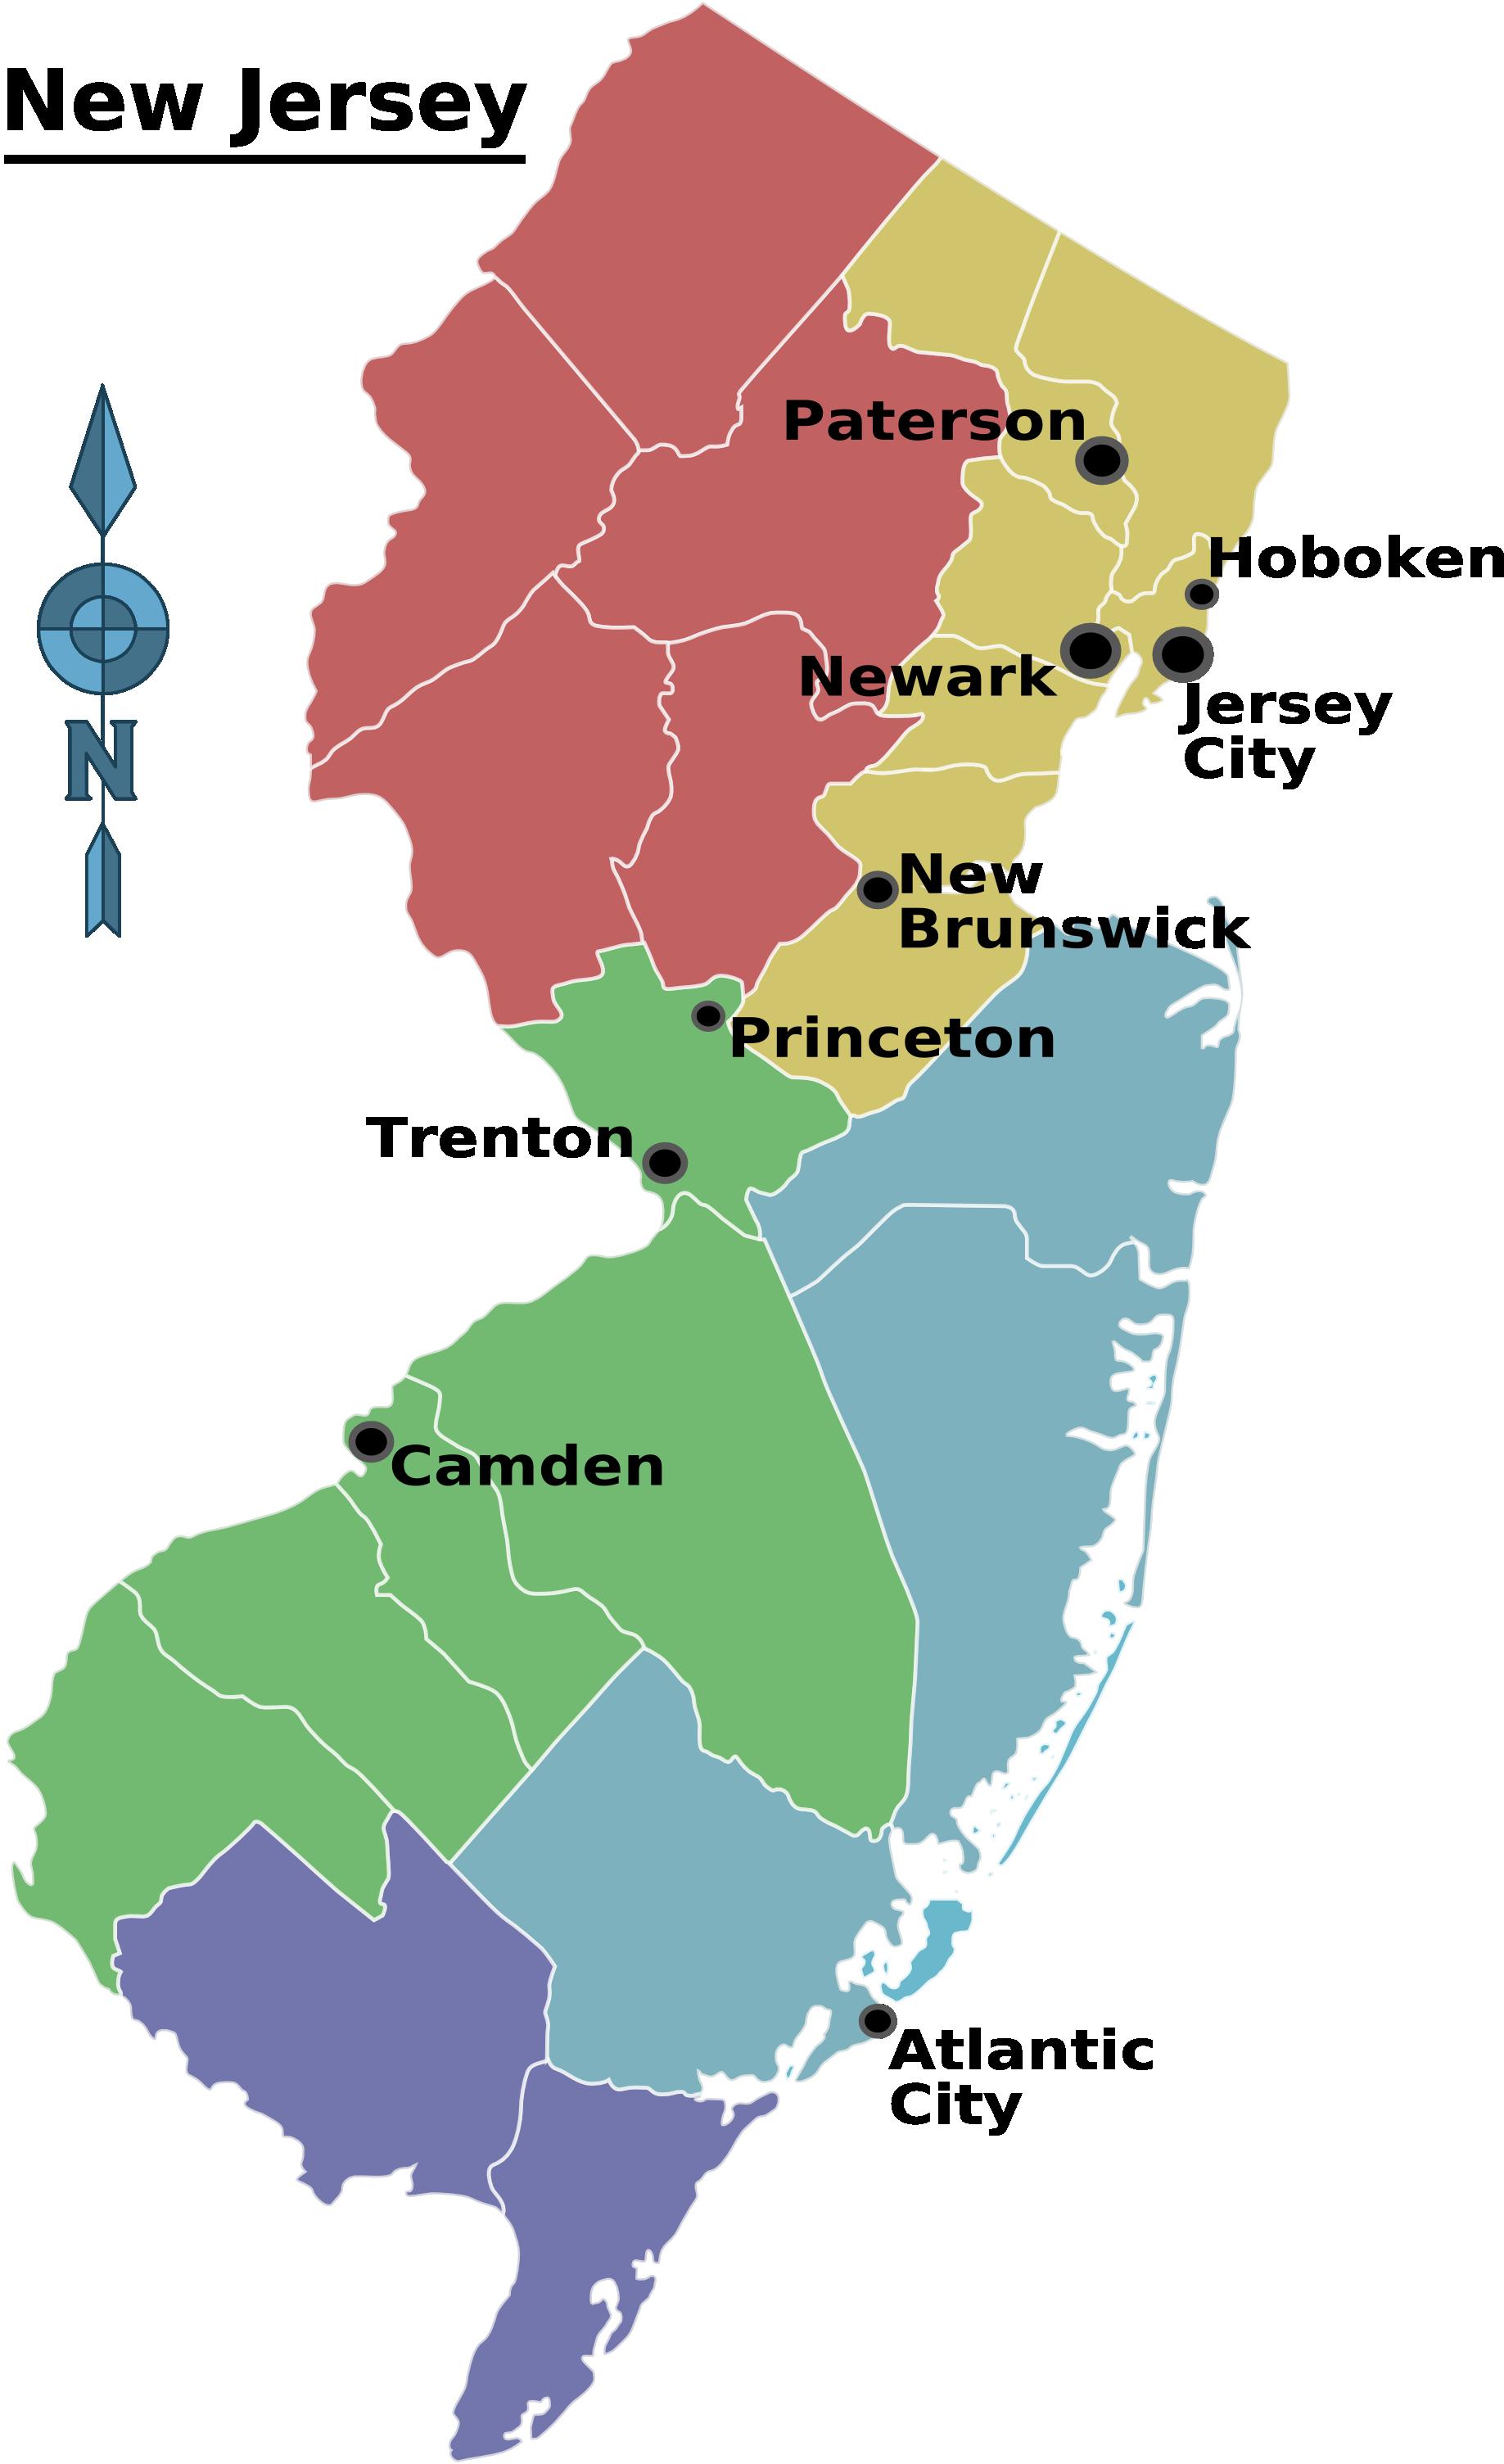 Caldwell New Jersey Map.New Jersey Regions Map Paddle South Orange Nj Orange Nj East